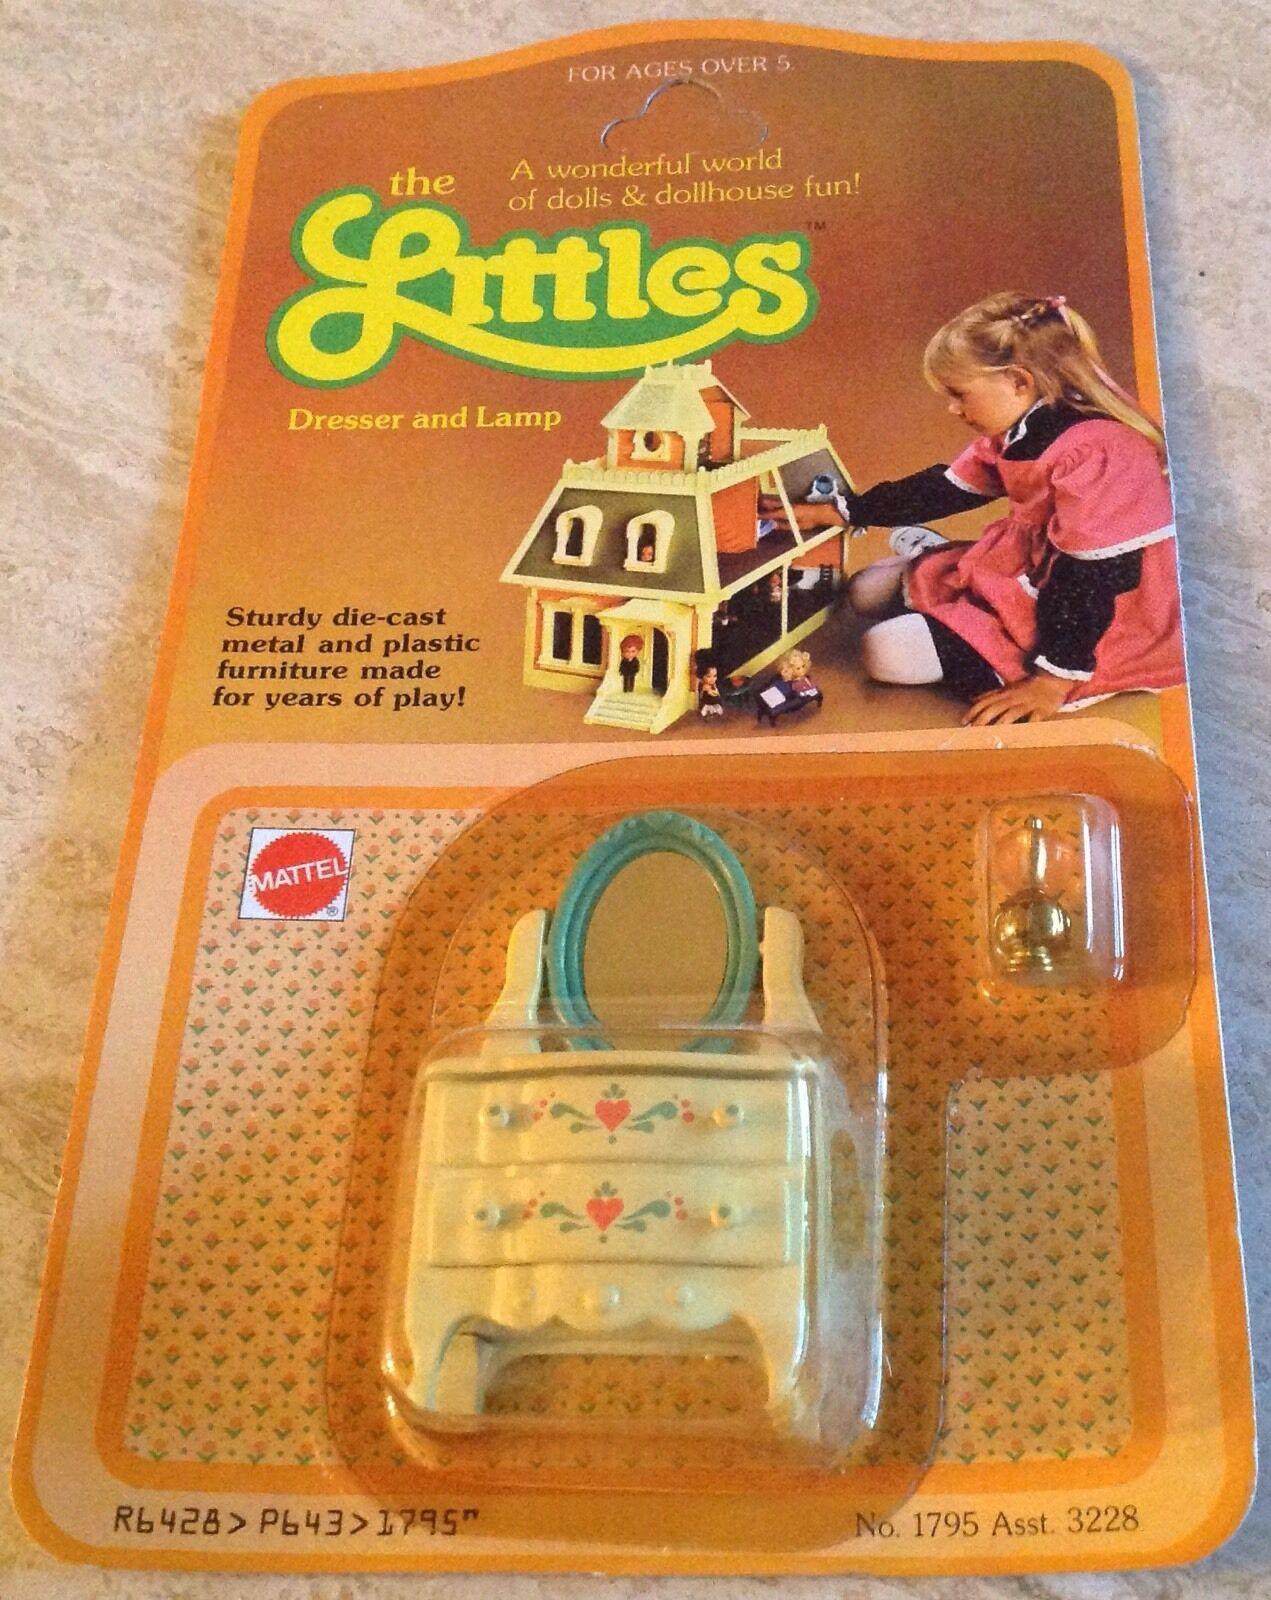 Vintage 1980 Littles by Mattel Dollhouse Furniture Furniture Furniture Die Cast Dresser Lamp NOS 025da5